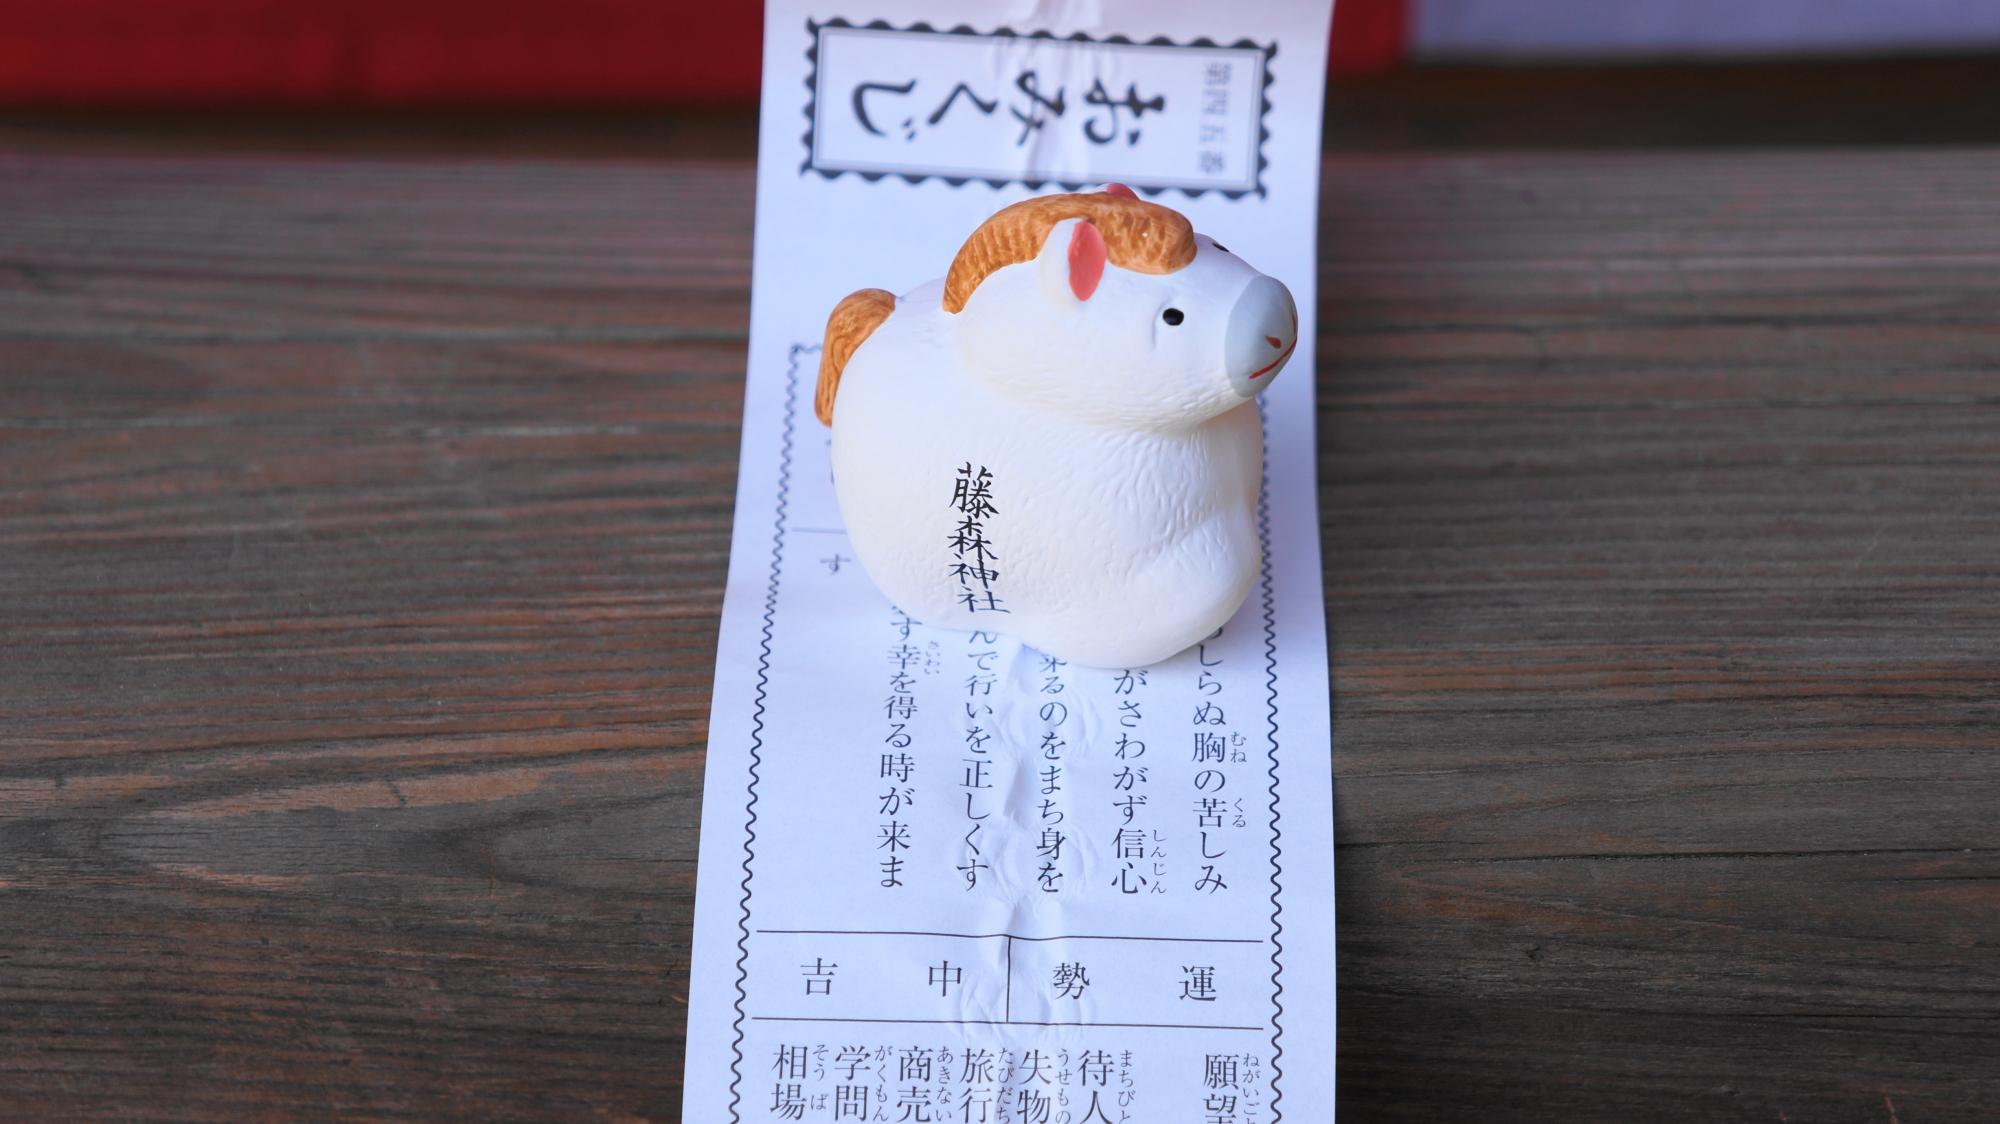 Fujinomori-jinja Shrine Kyoto Paper fortune 馬の神様 藤森神社